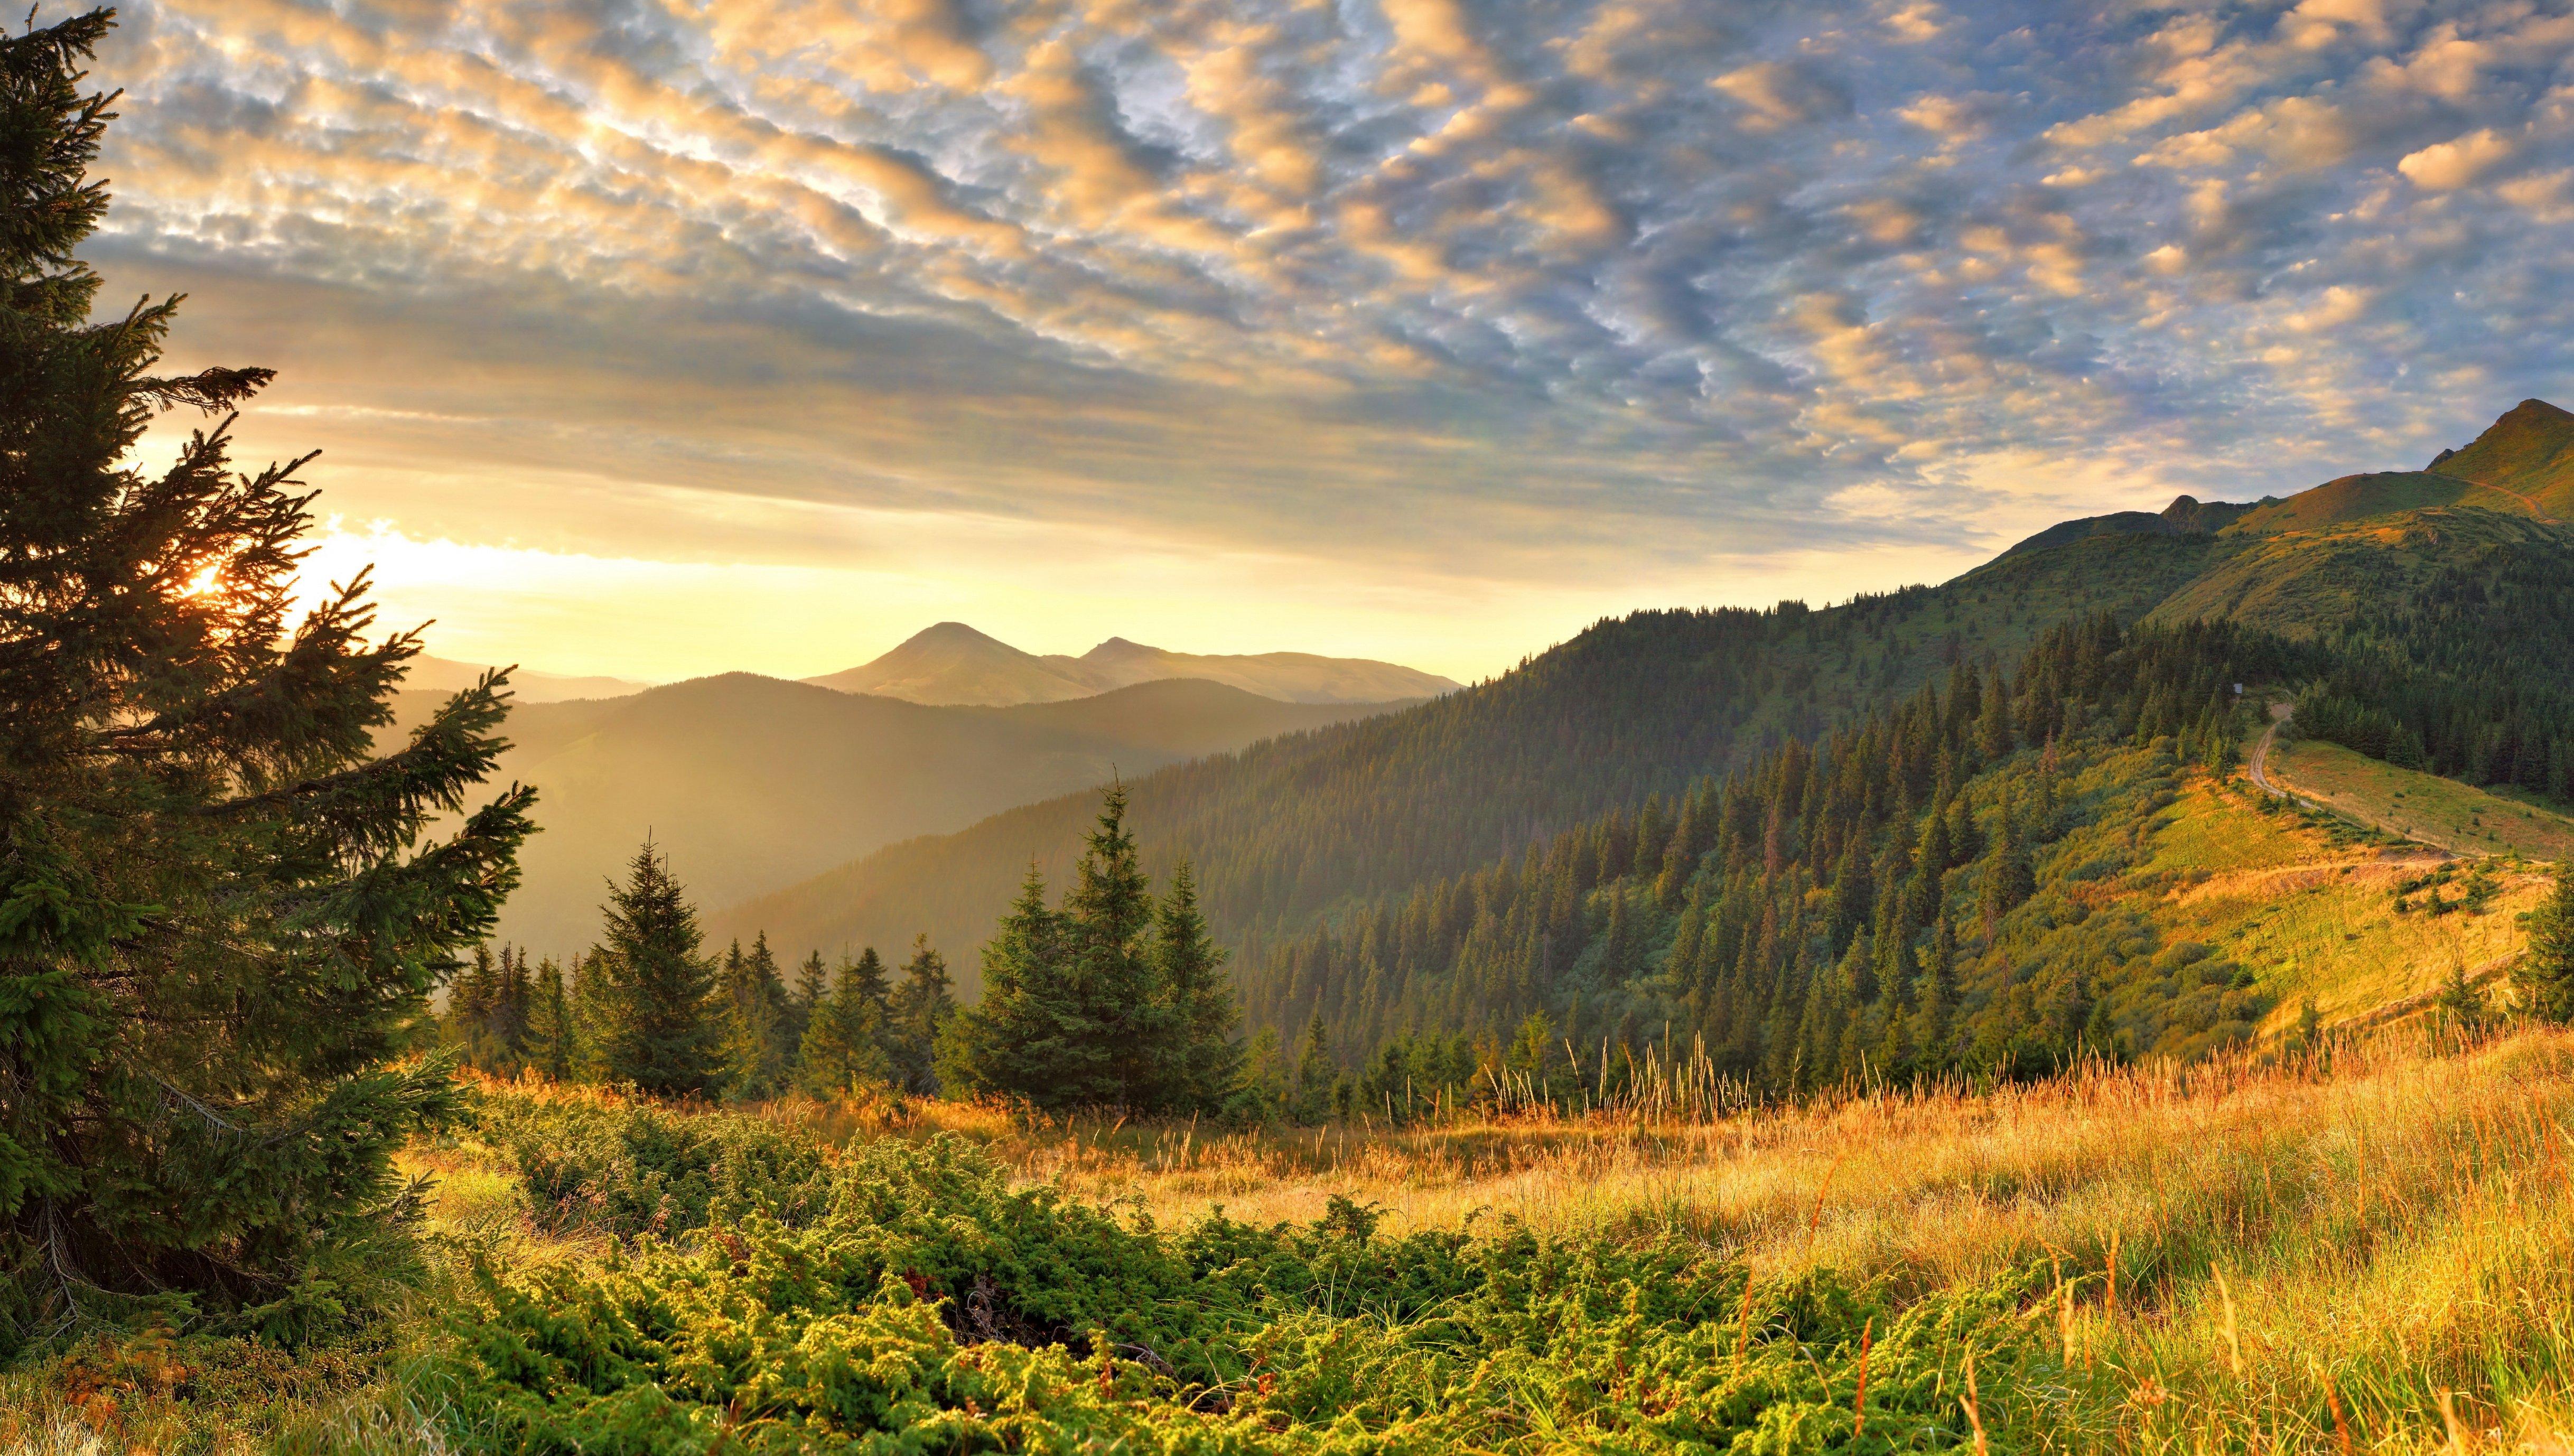 Scenery Sky Mountains Grass Nature wallpaper 4872x2756 175148 4872x2756